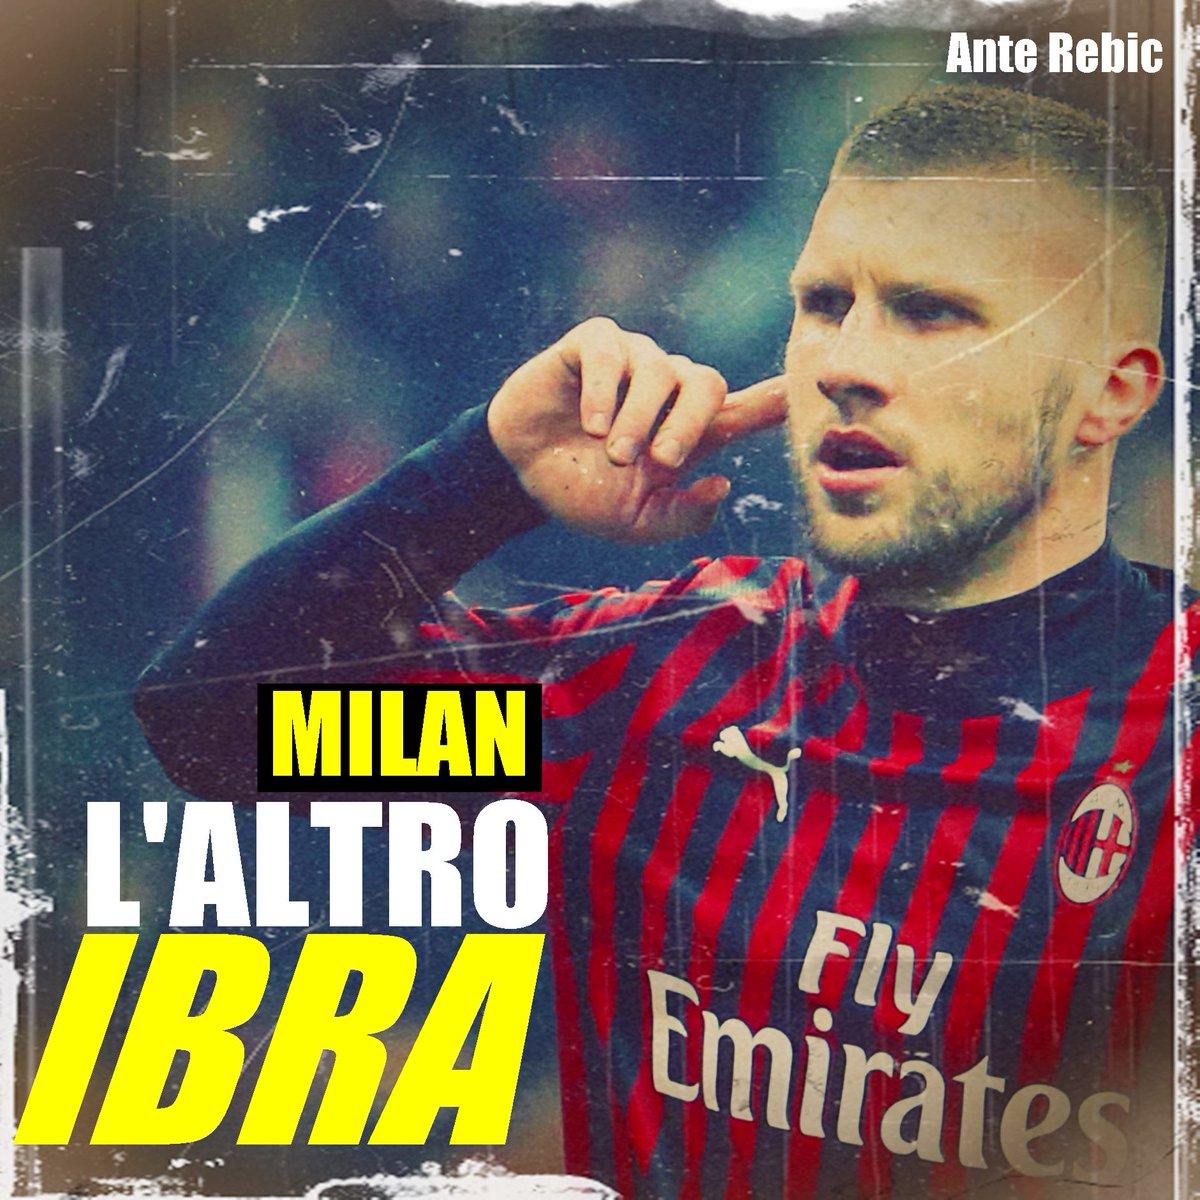 #MilanTorino